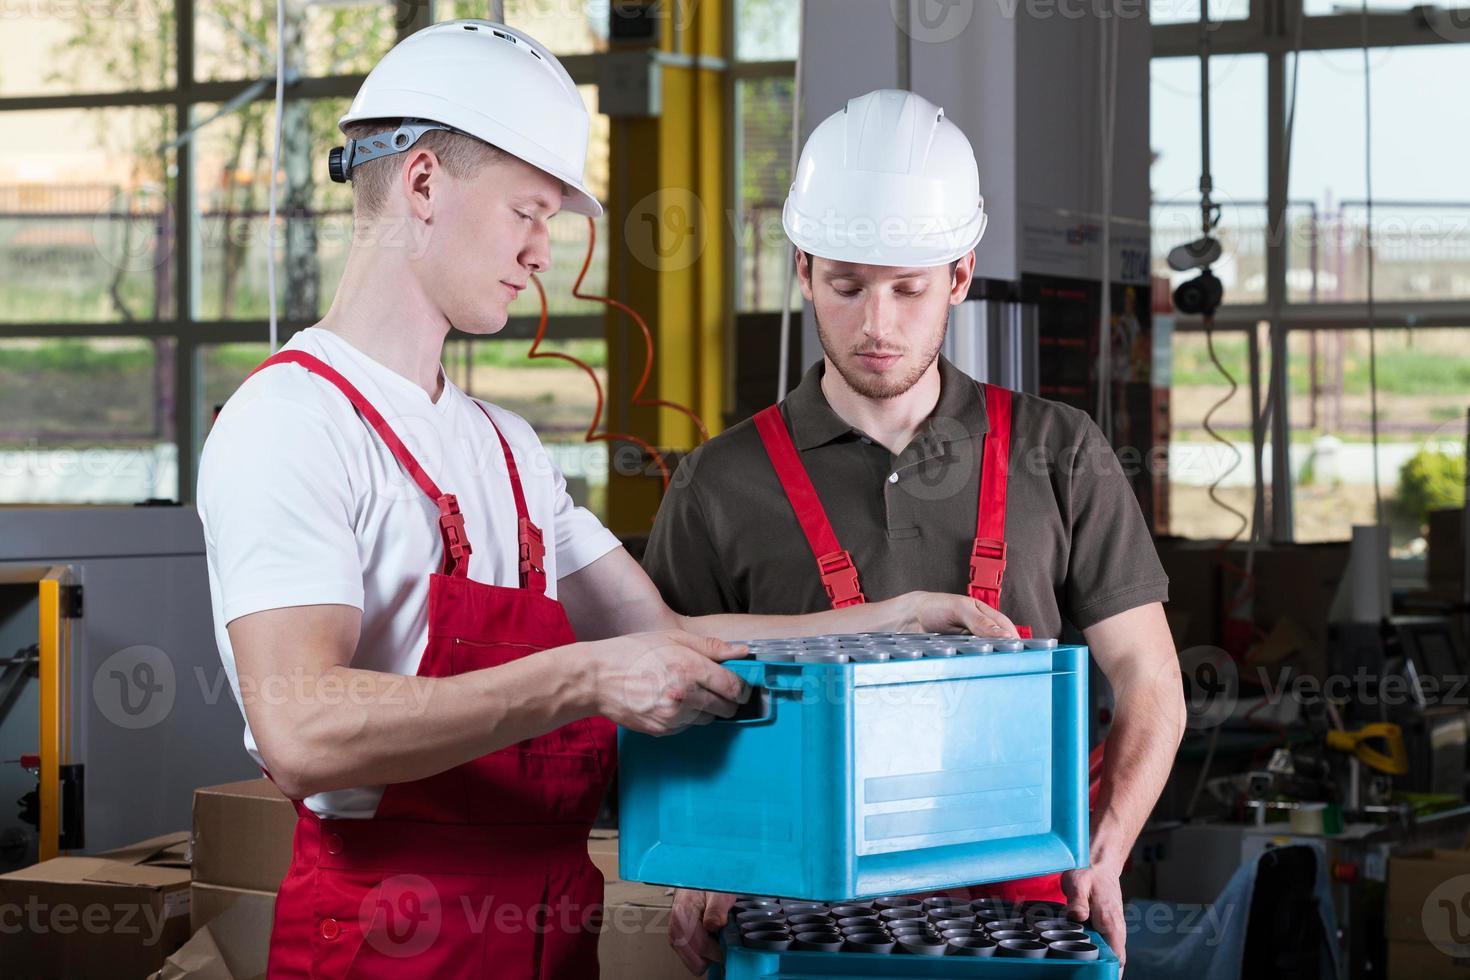 ingenjörer under arbetet i en fabrik foto